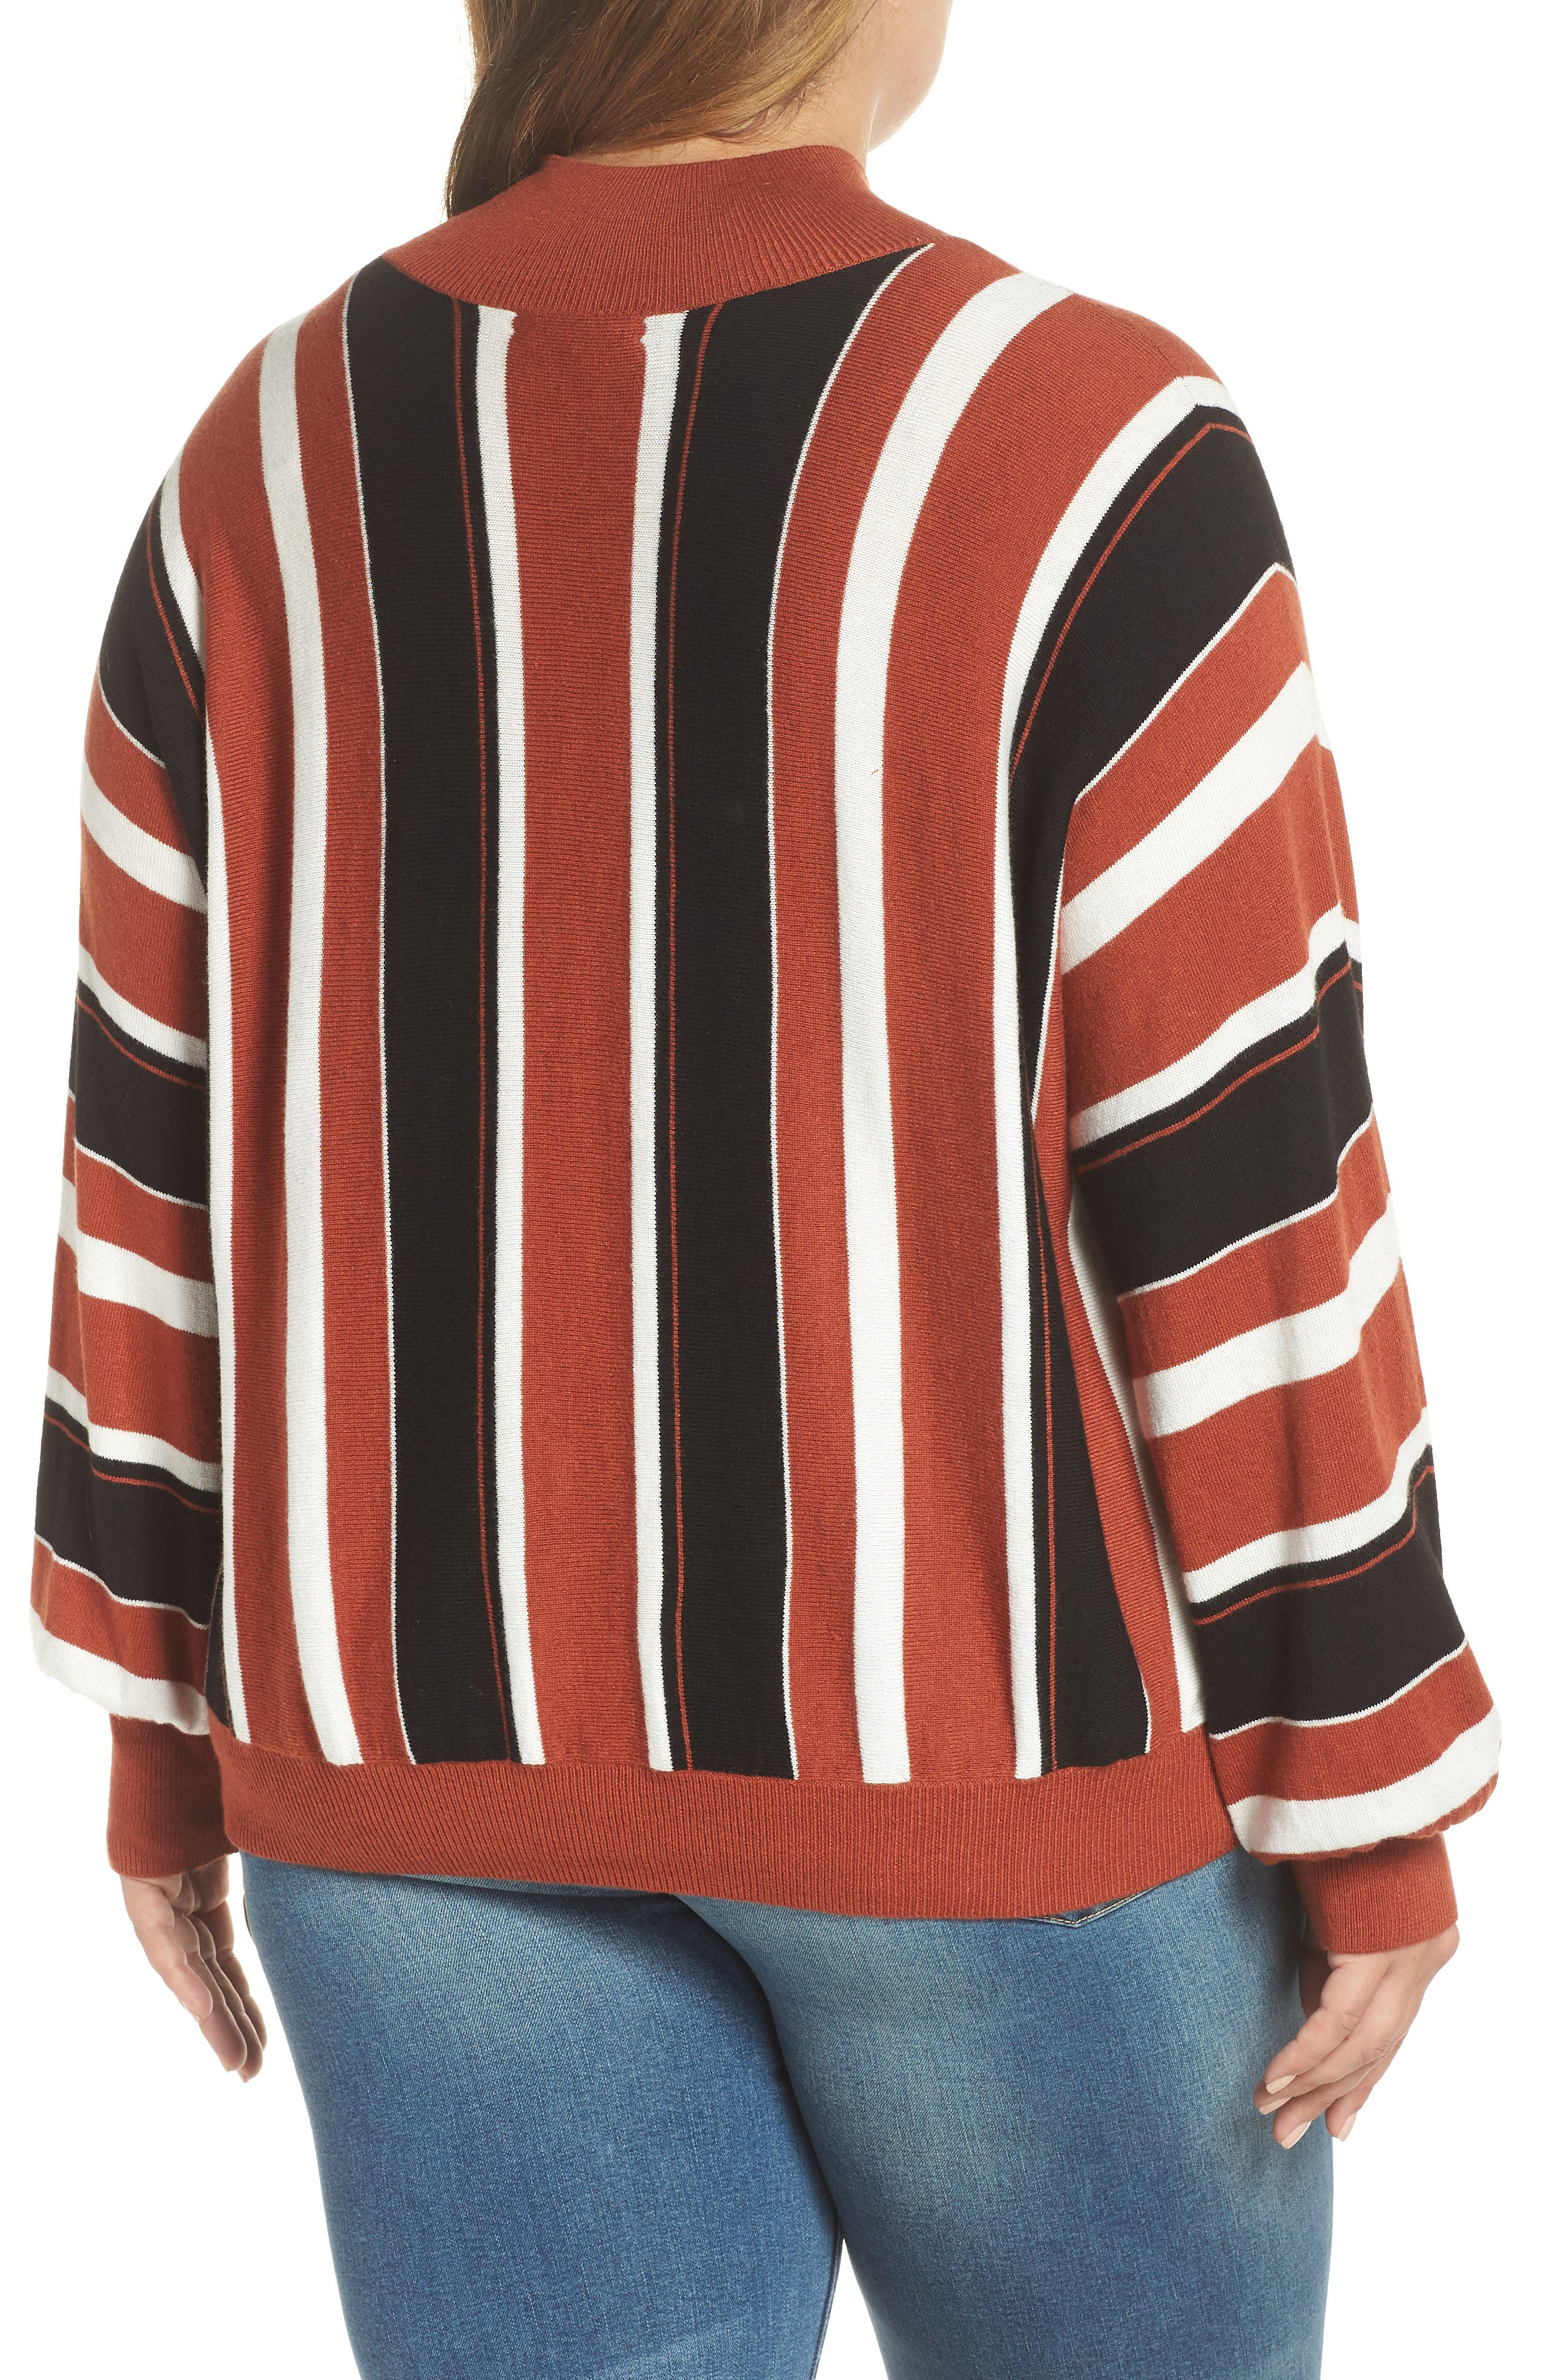 Stripe Dolman Sleeve Sweater,                             Alternate thumbnail 8, color,                             210